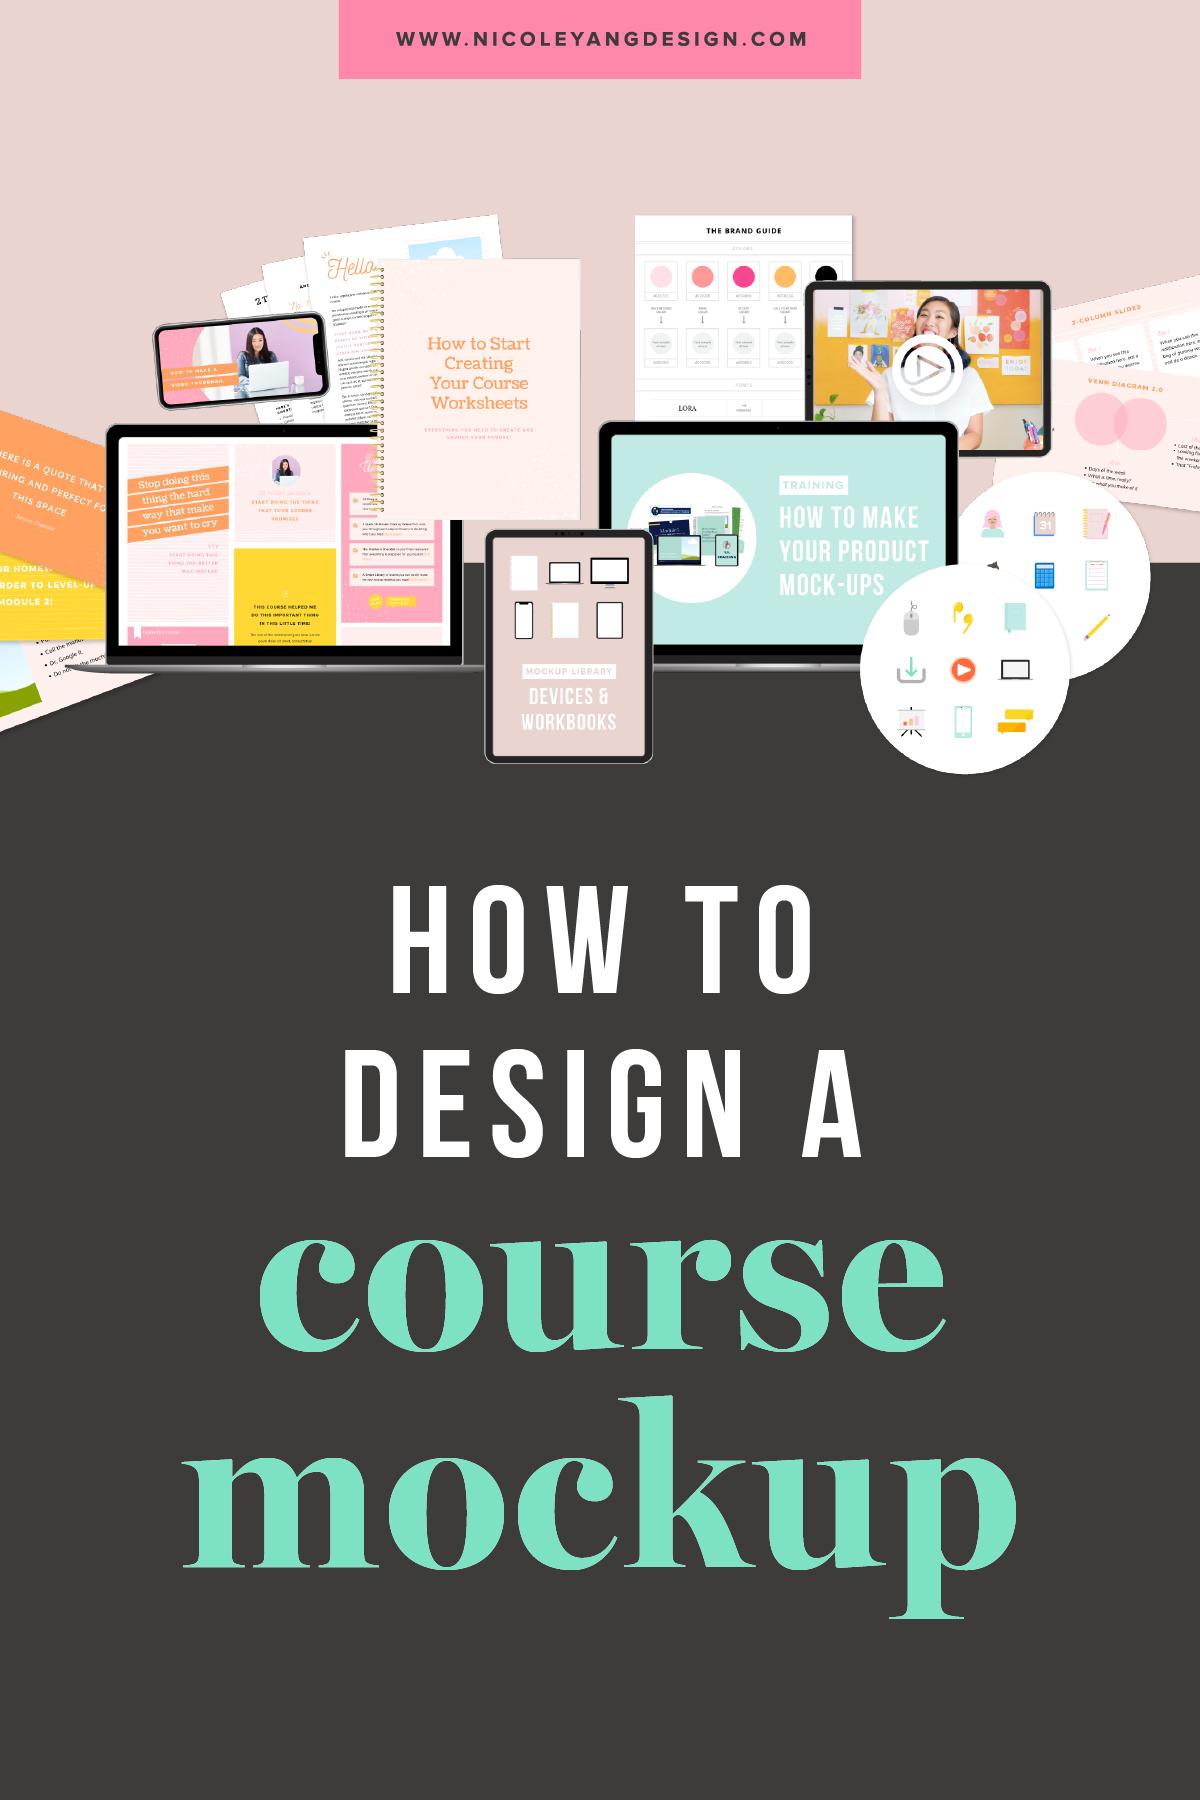 Course mockup